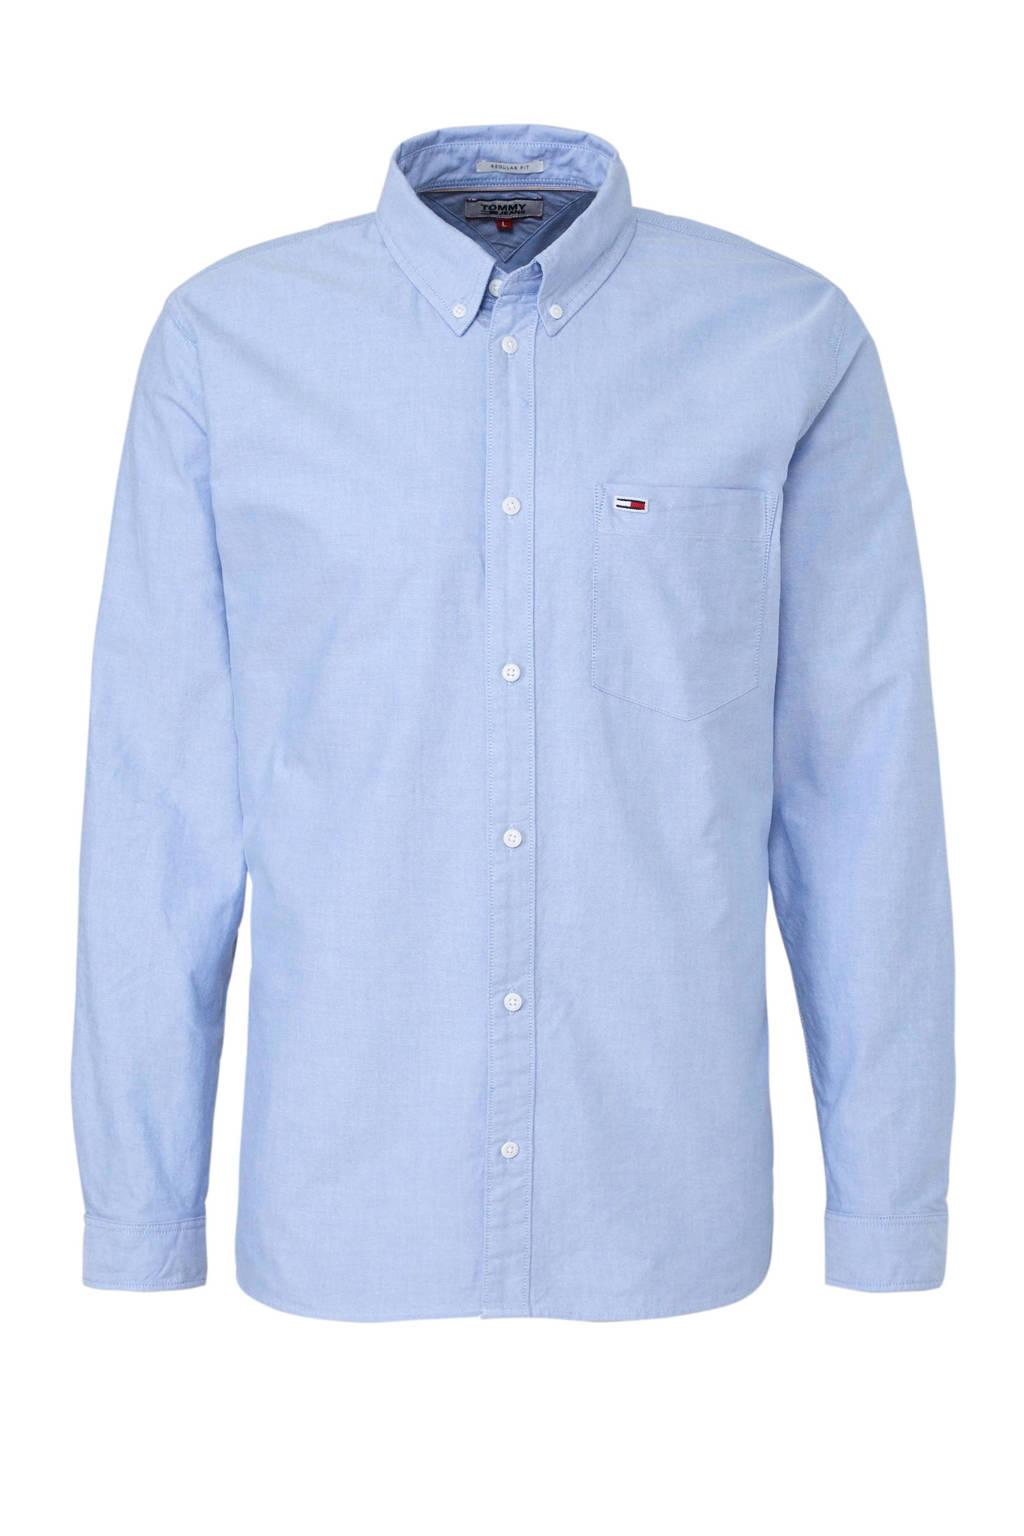 Overhemd Blauw.Tommy Jeans Regular Fit Overhemd Blauw Wehkamp